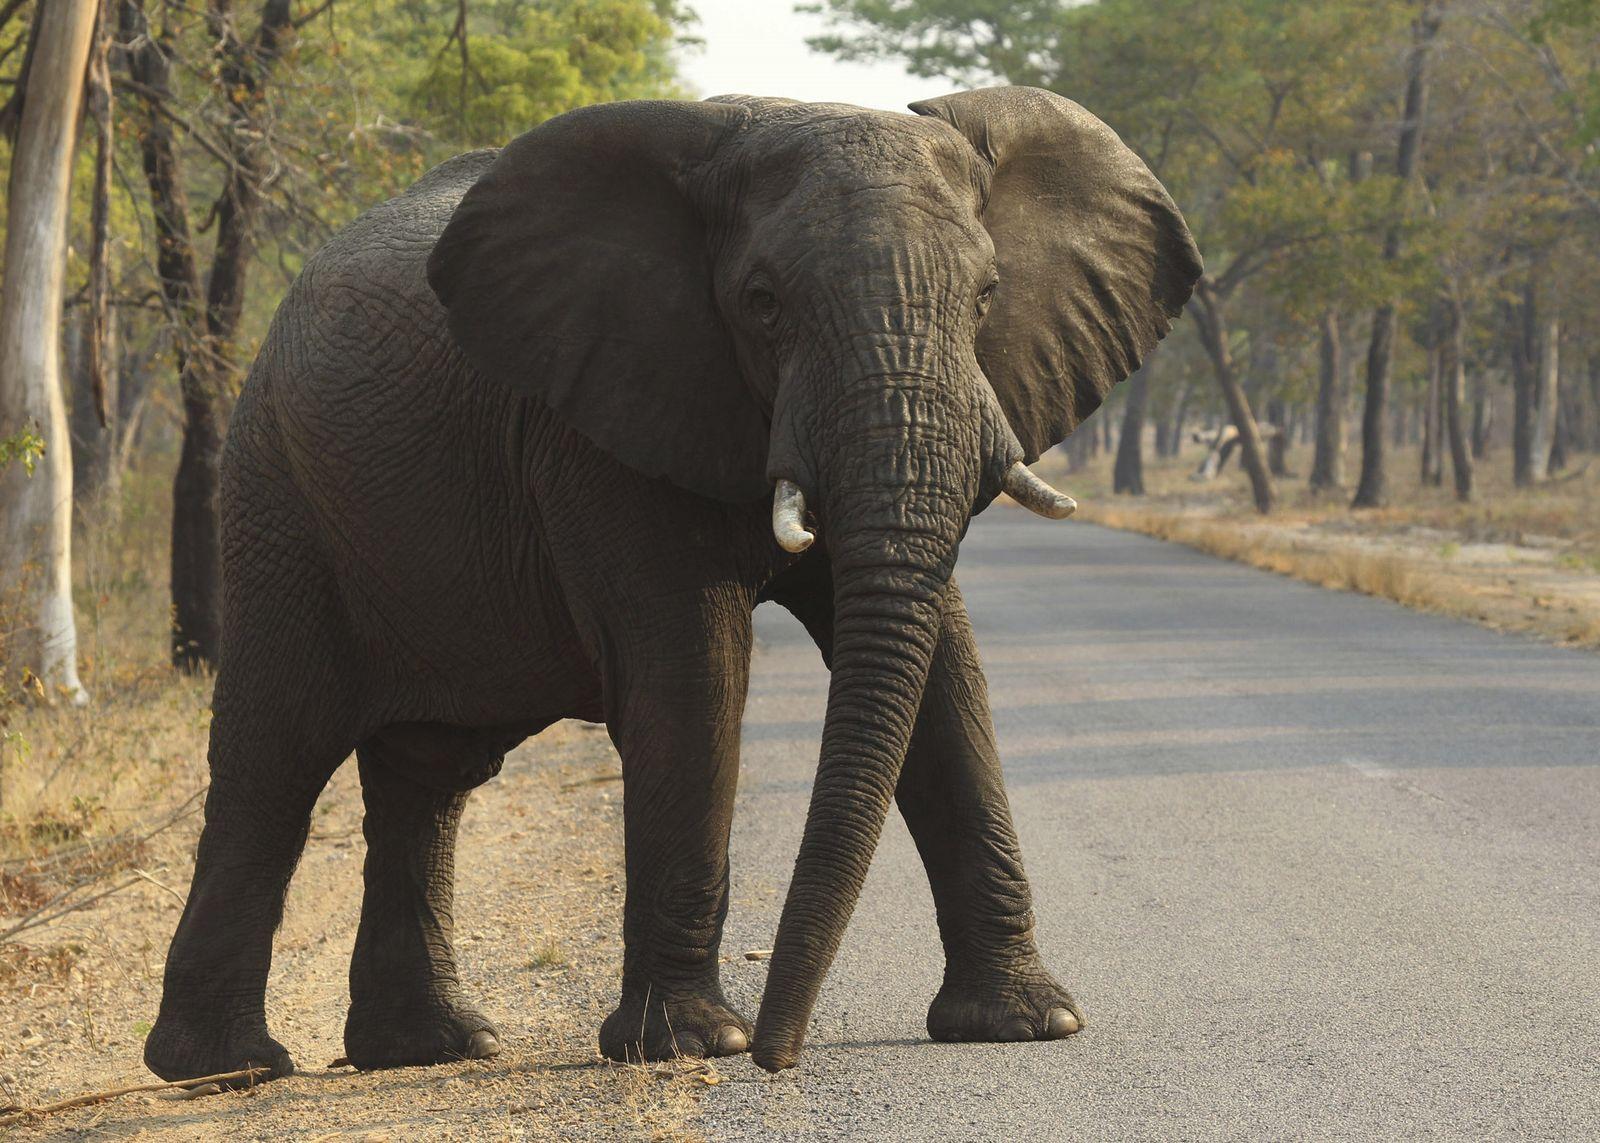 Dutzende Elefanten sterben bei Dürre in Simbabwe